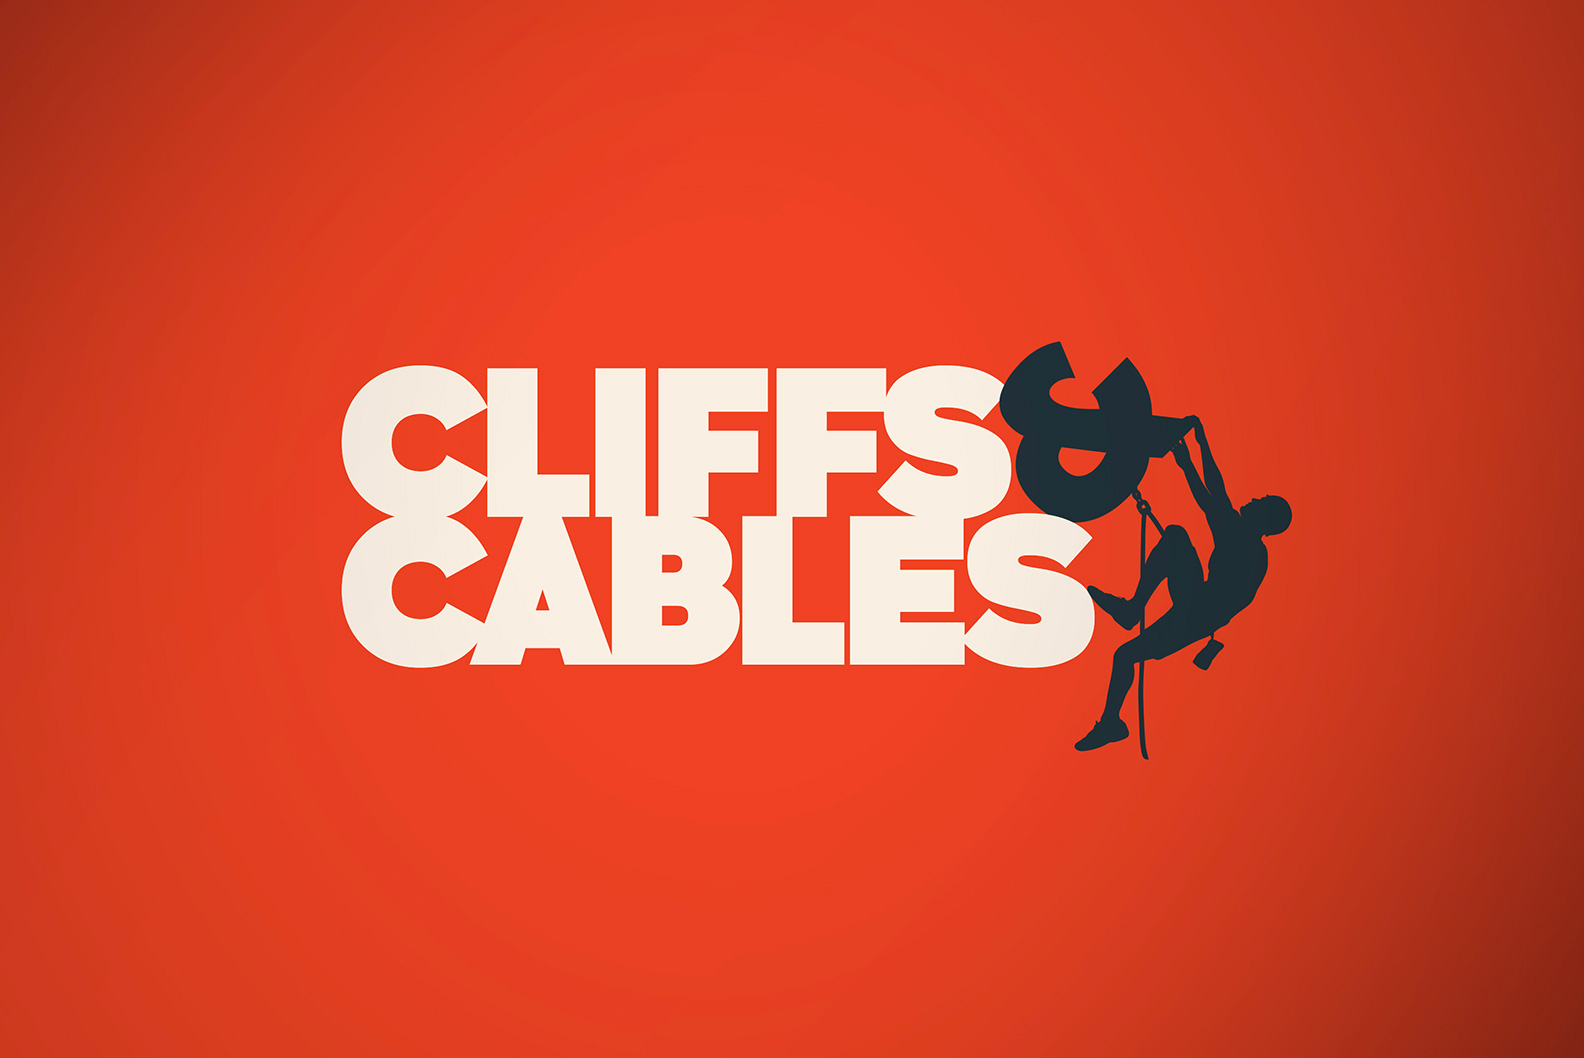 cliffs-cables-LOGO-OPT.jpg